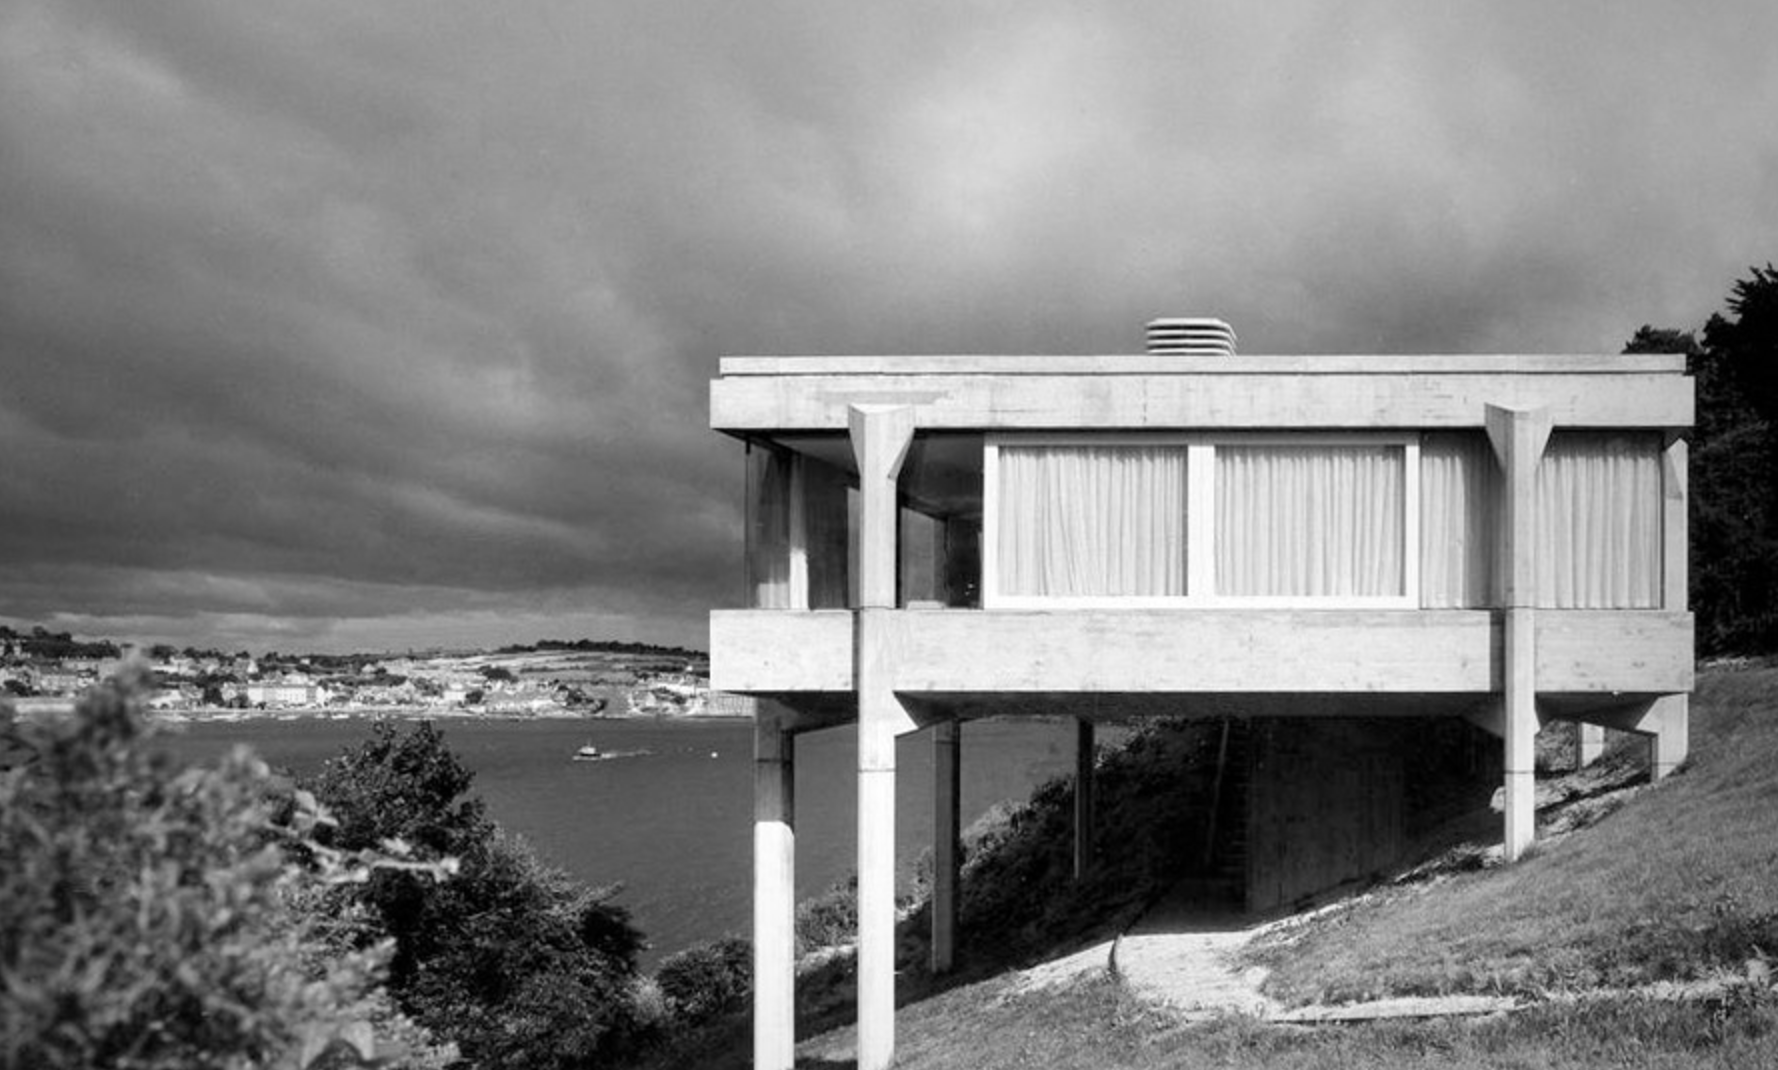 OFlaherty House, Kinsale - Robin Walker - Prime Architecture London Blog 3.png